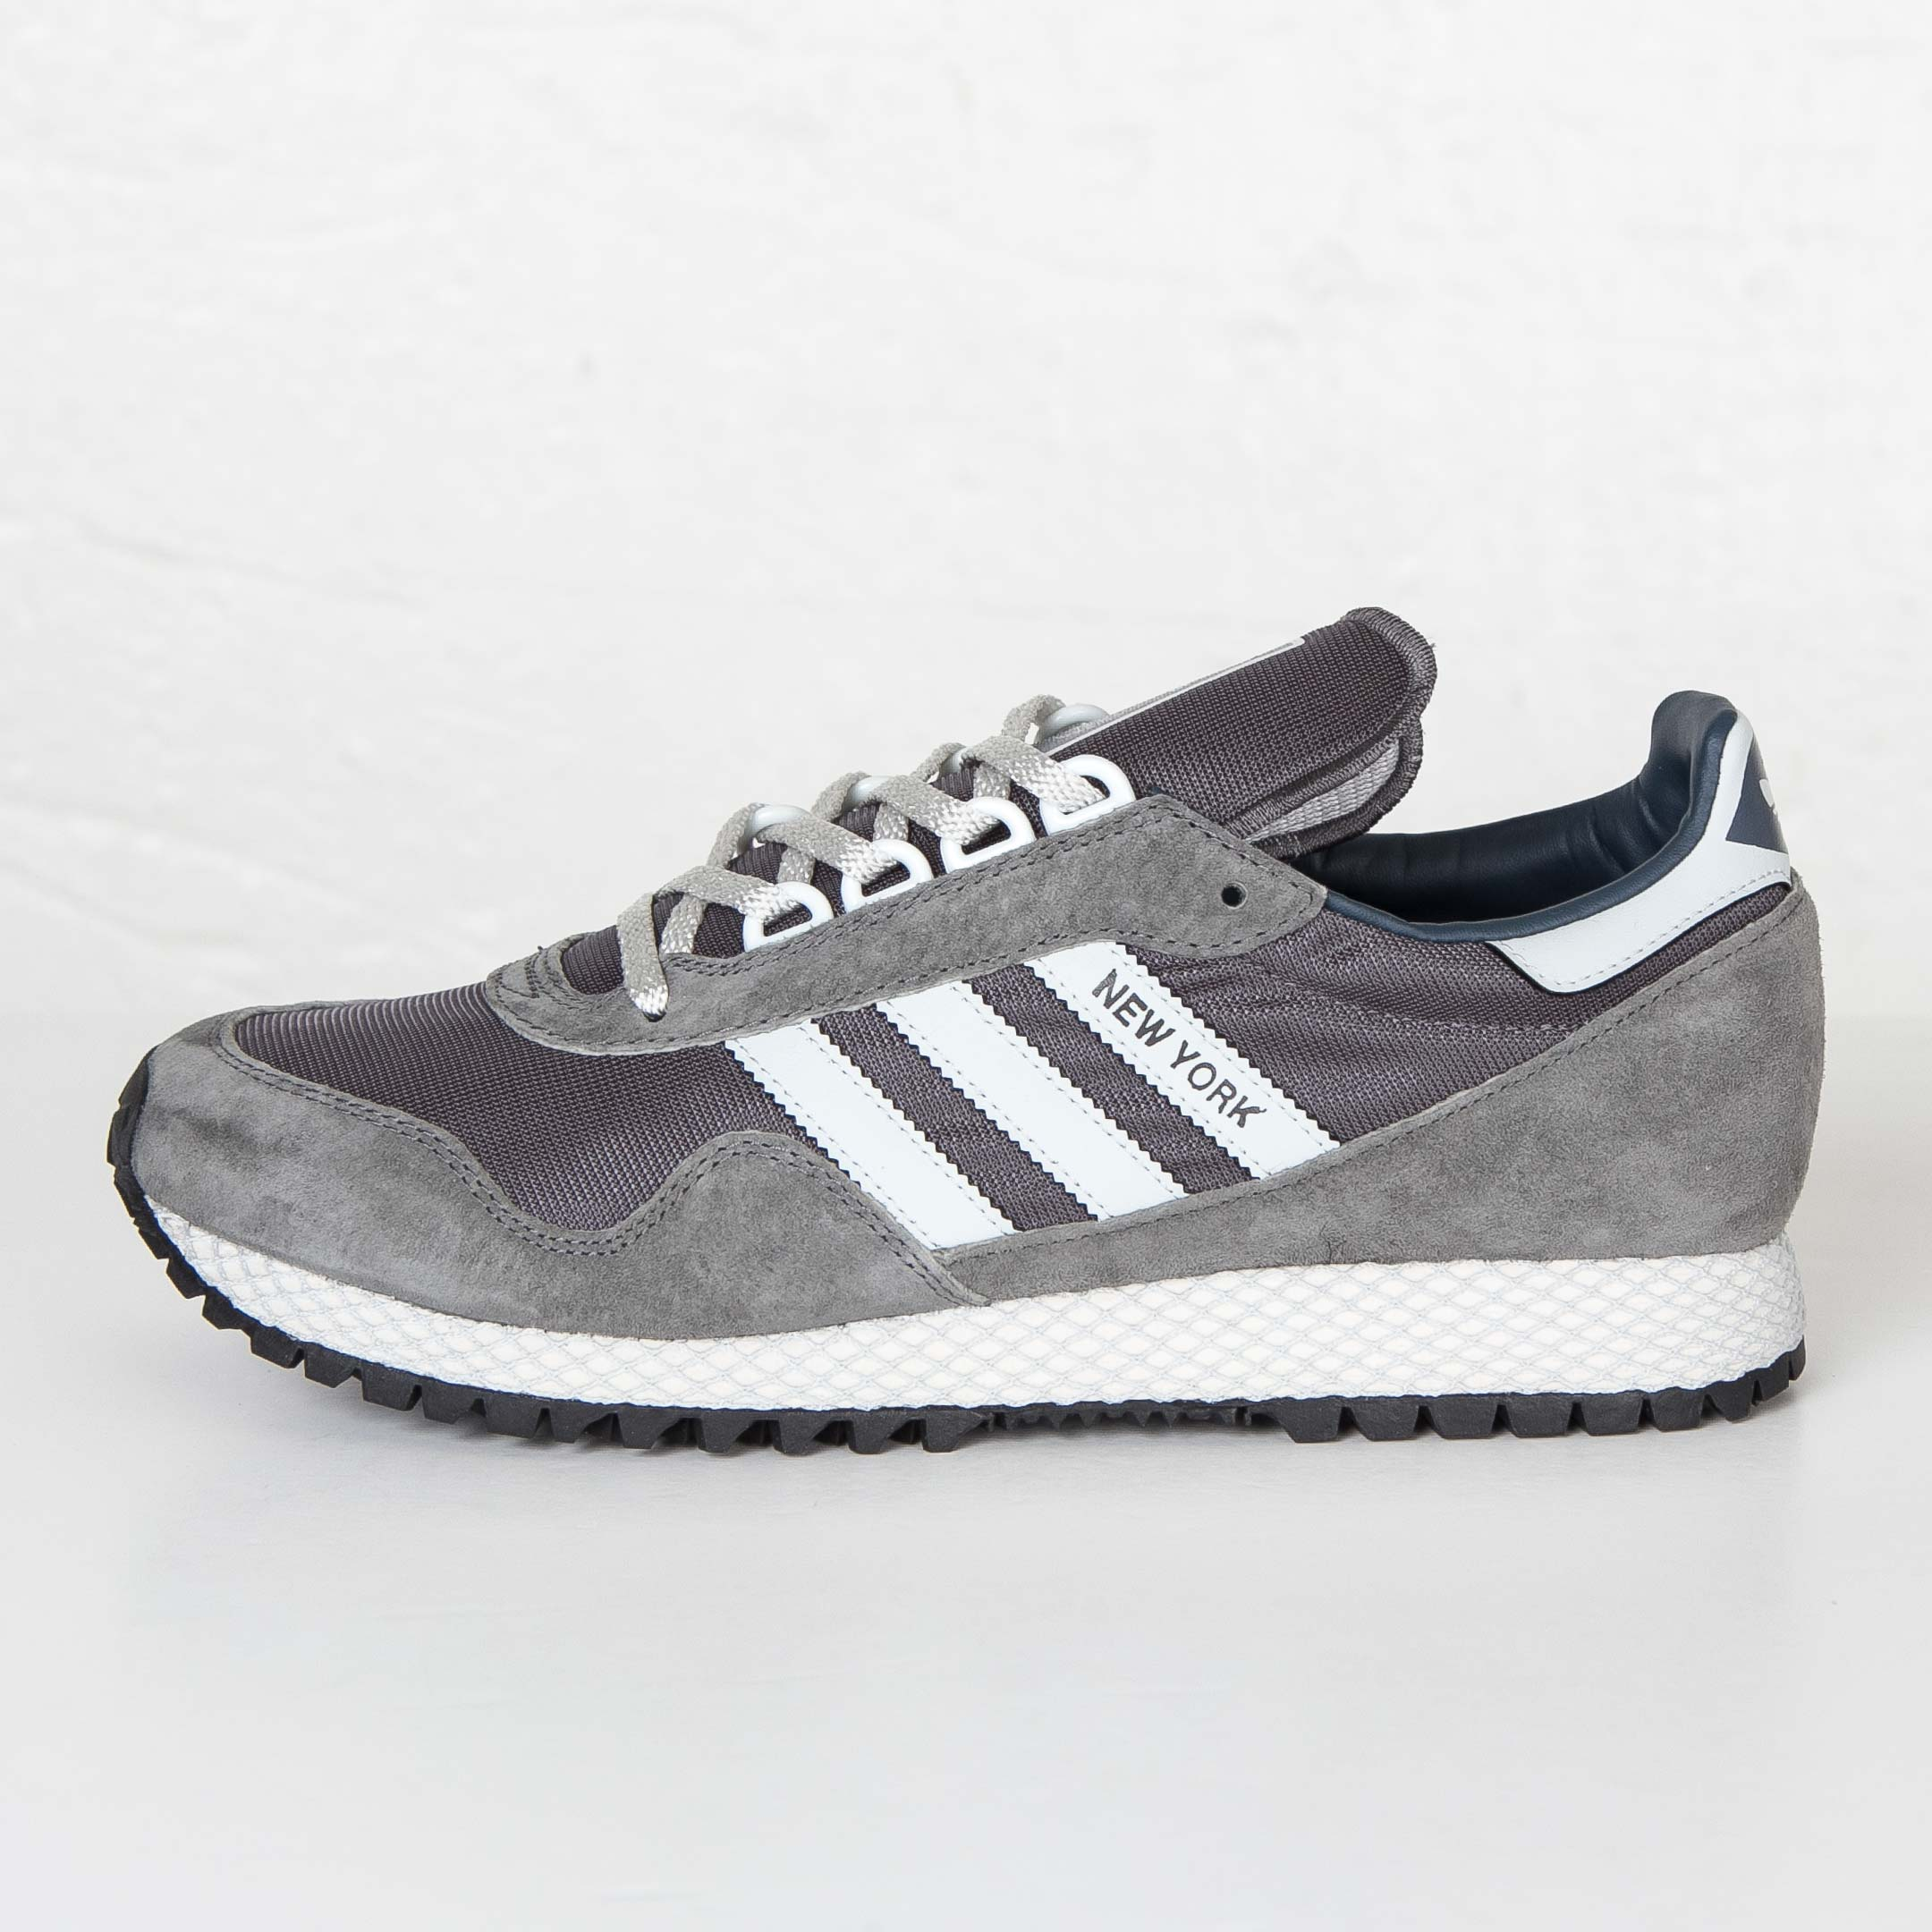 adidas New York SPZL - B41179 - Sneakersnstuff | sneakers ...